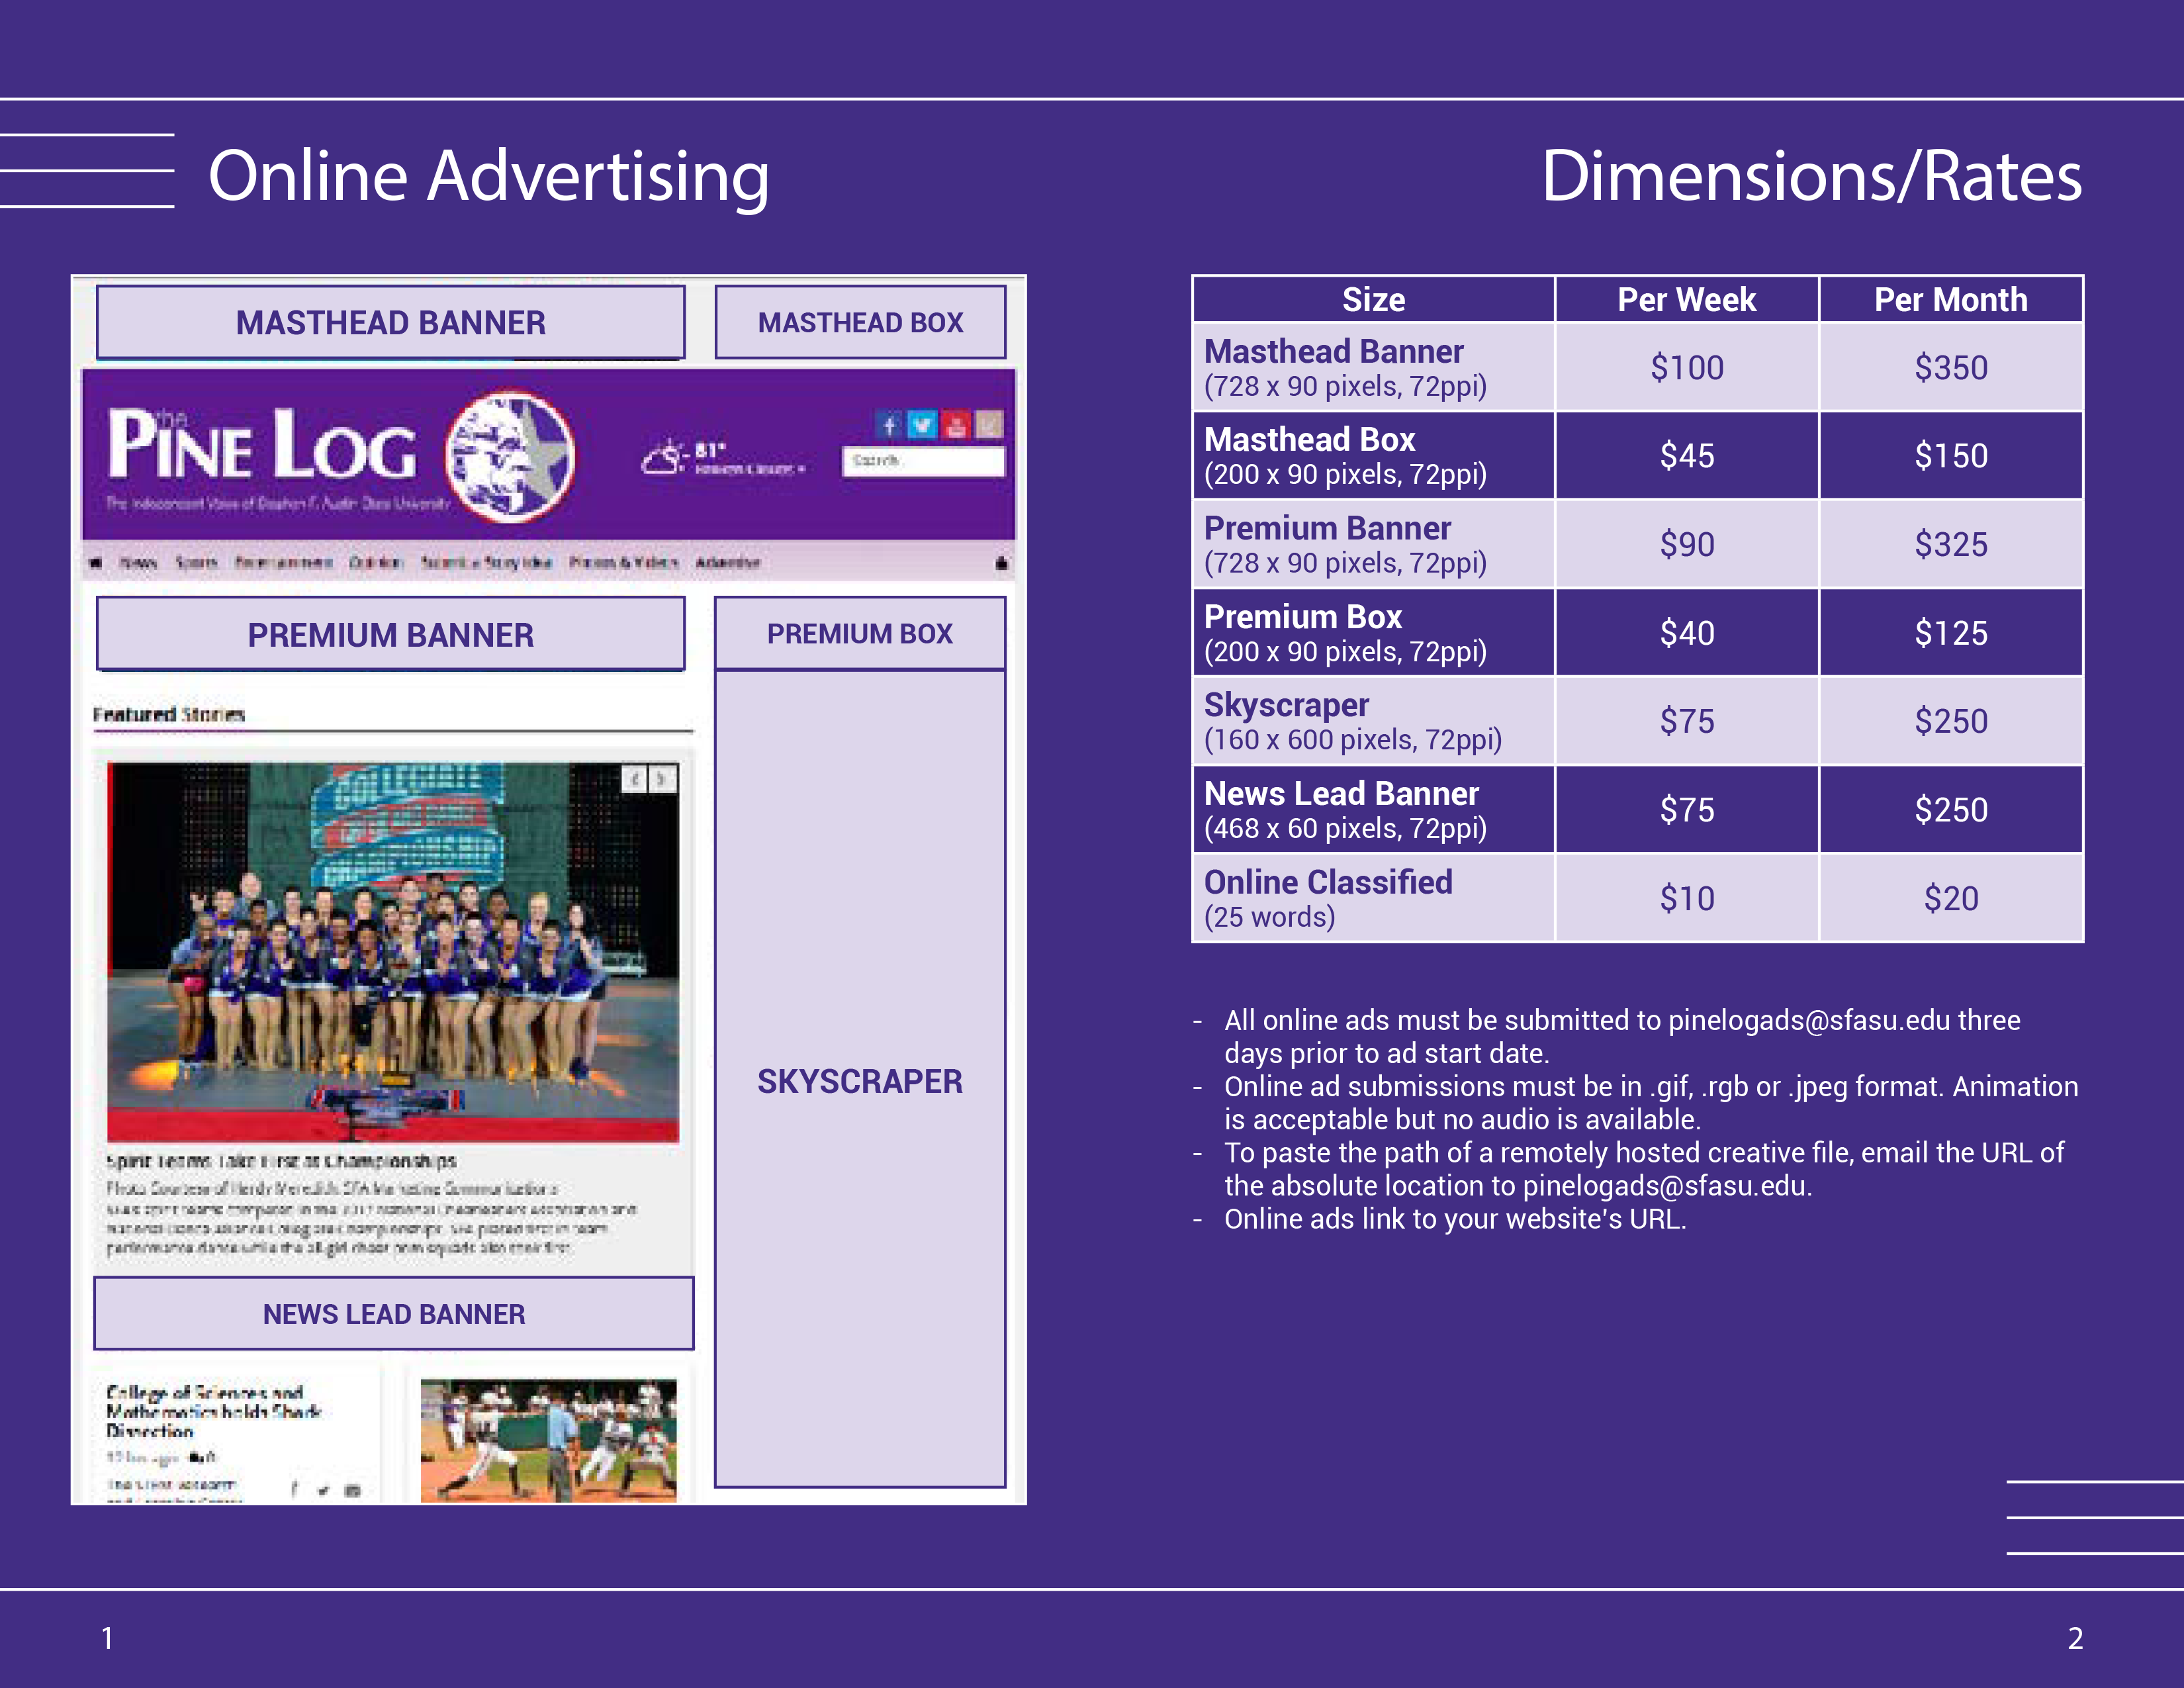 PL 20-21 Online Ad Rates